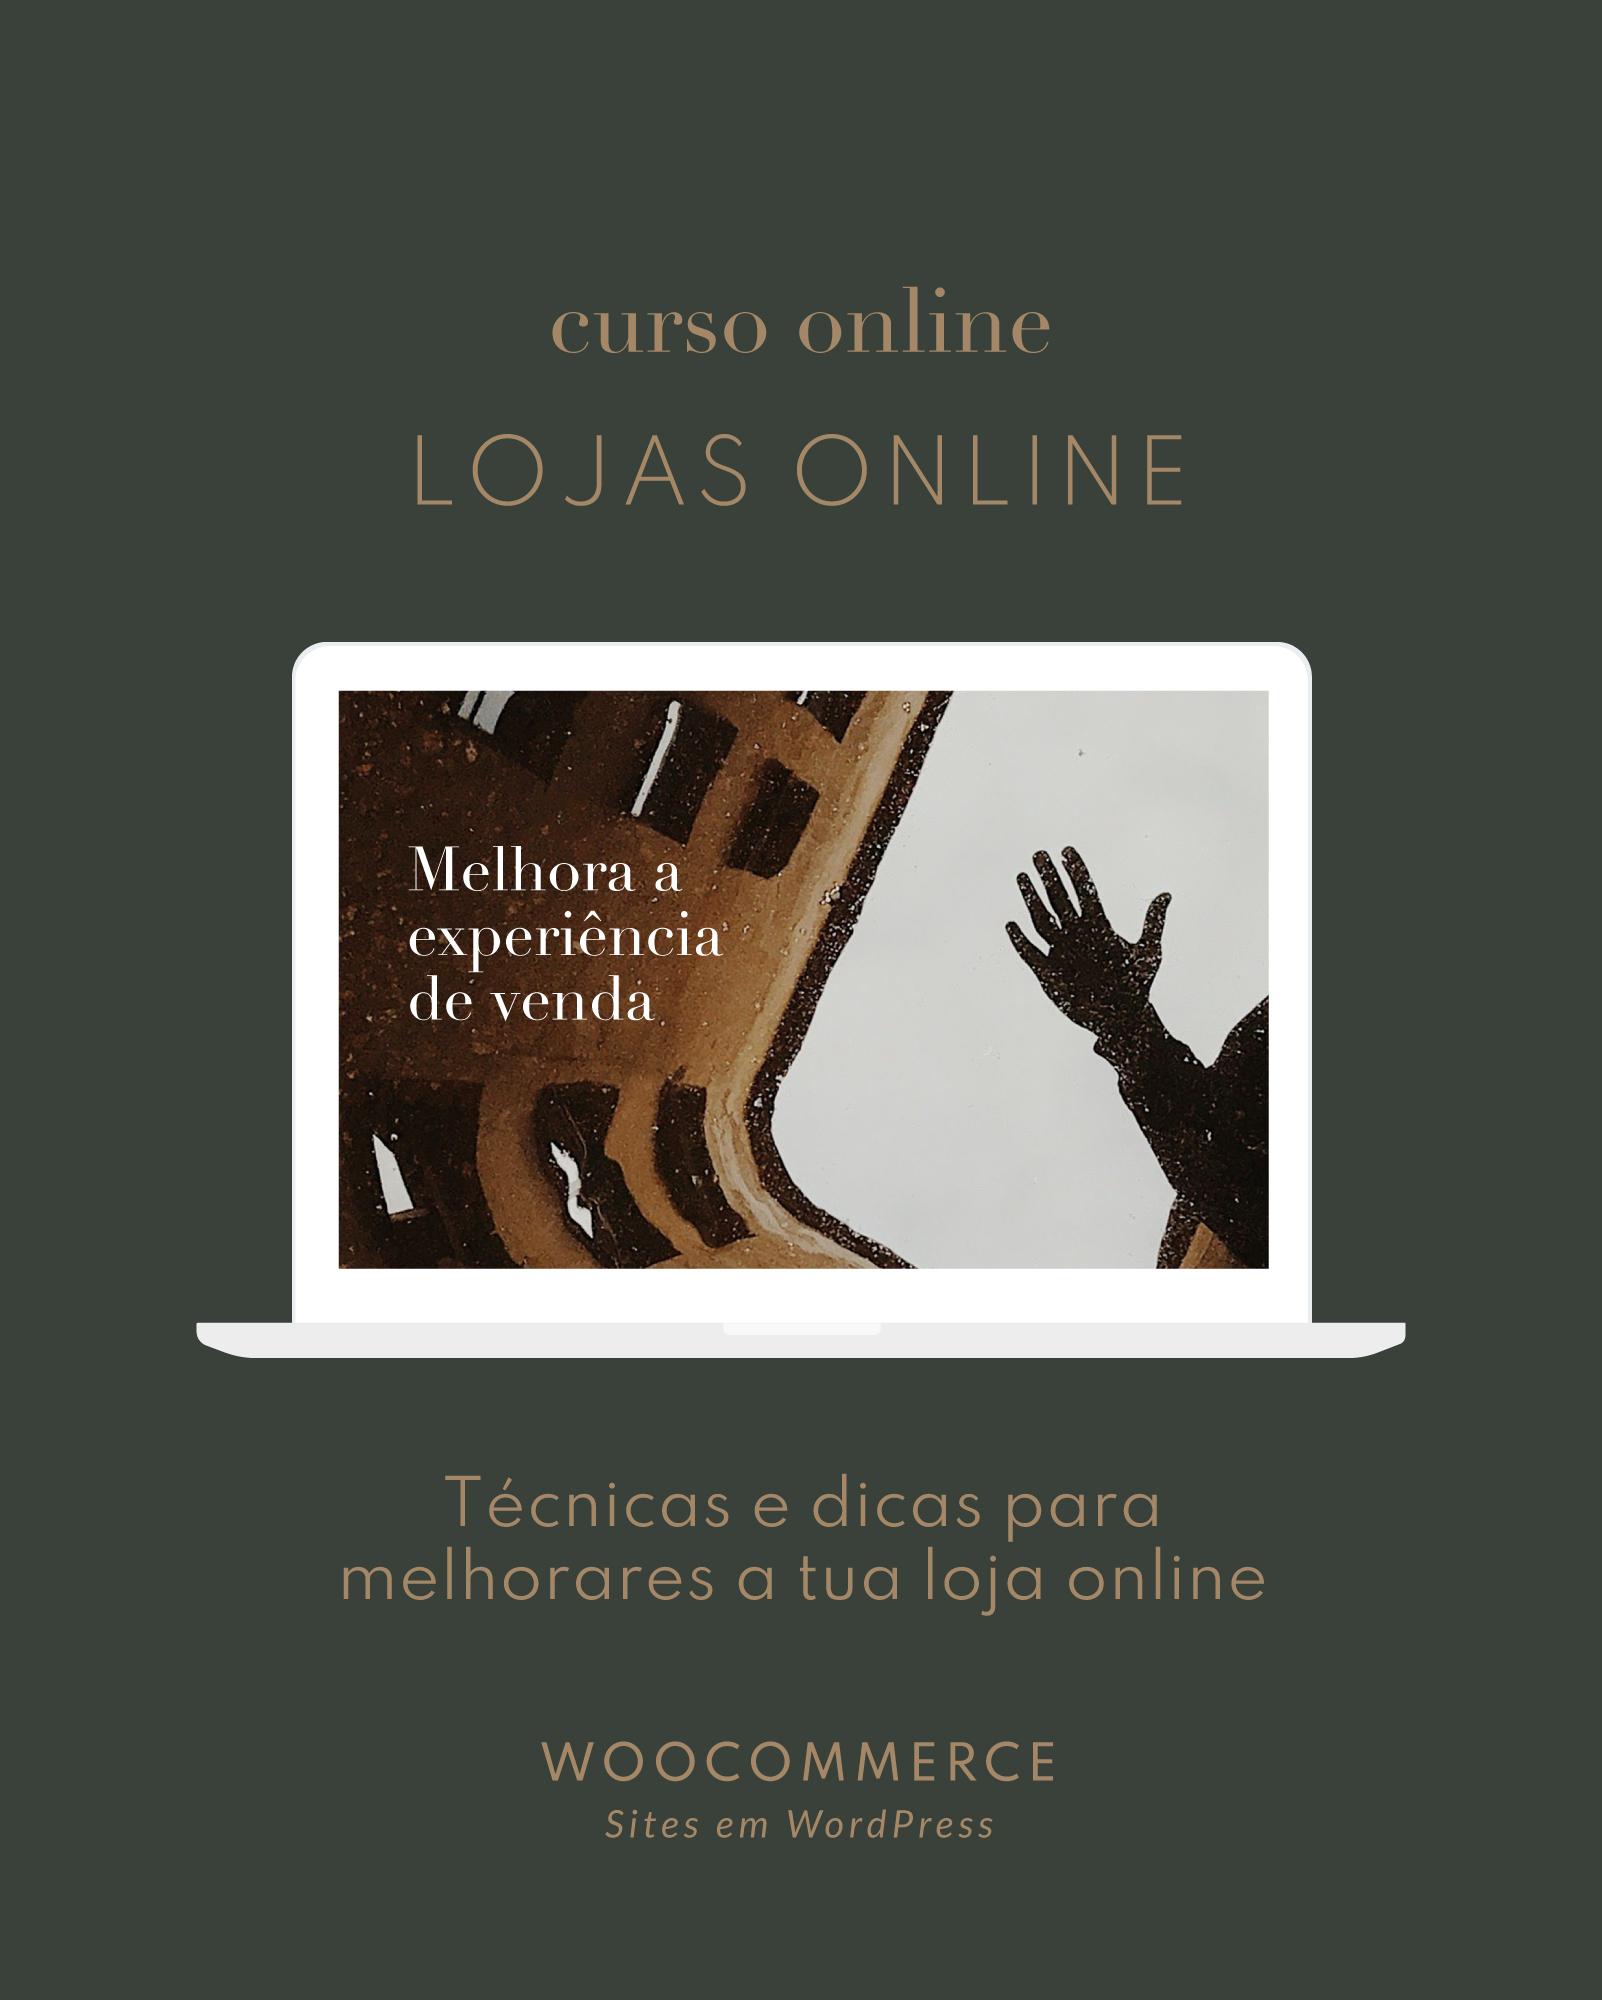 Curso online lojas online